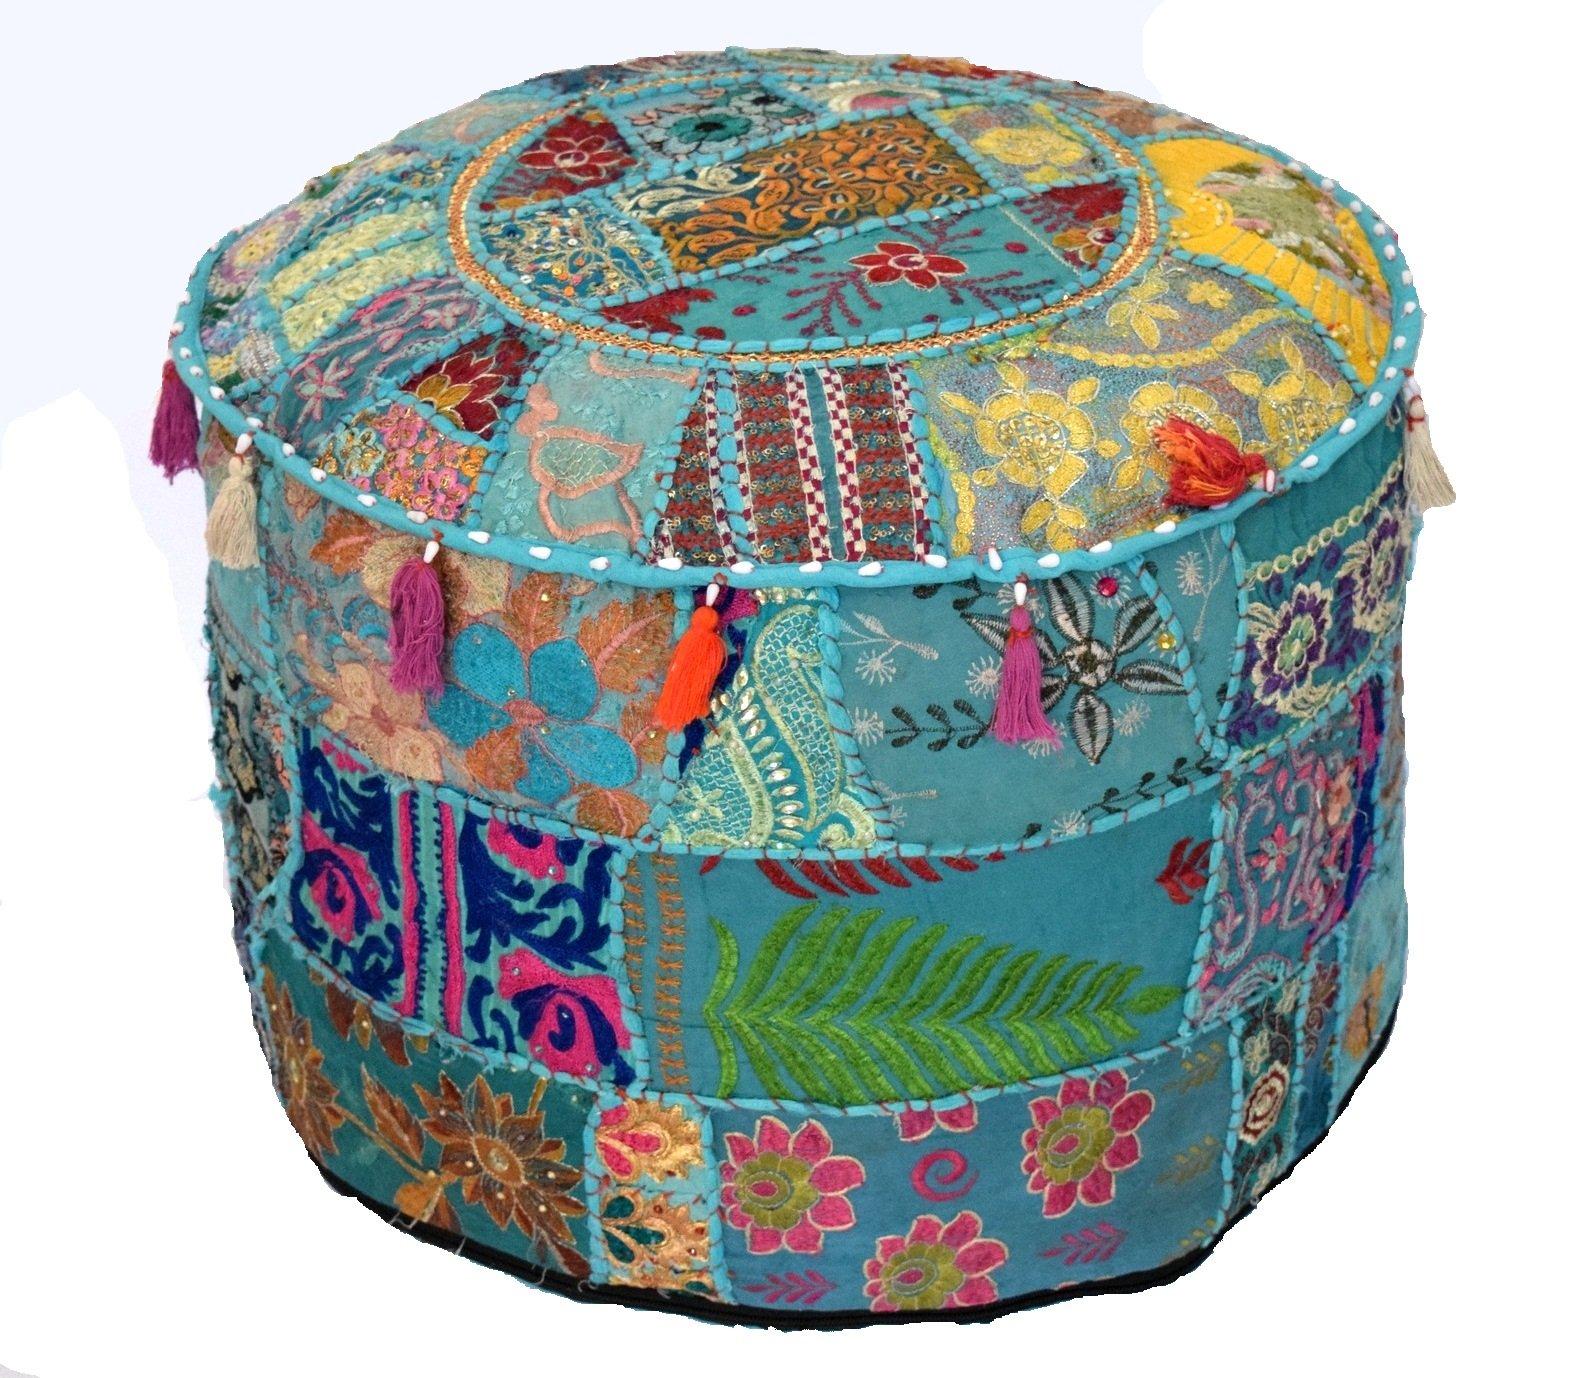 khushvin Vintage Sari Patchwork Ottoman Bohemian Indian Patchwork Ottoman Traditional Handmade Pouf Indian Patchwork Foot stool Ottoman 22x14